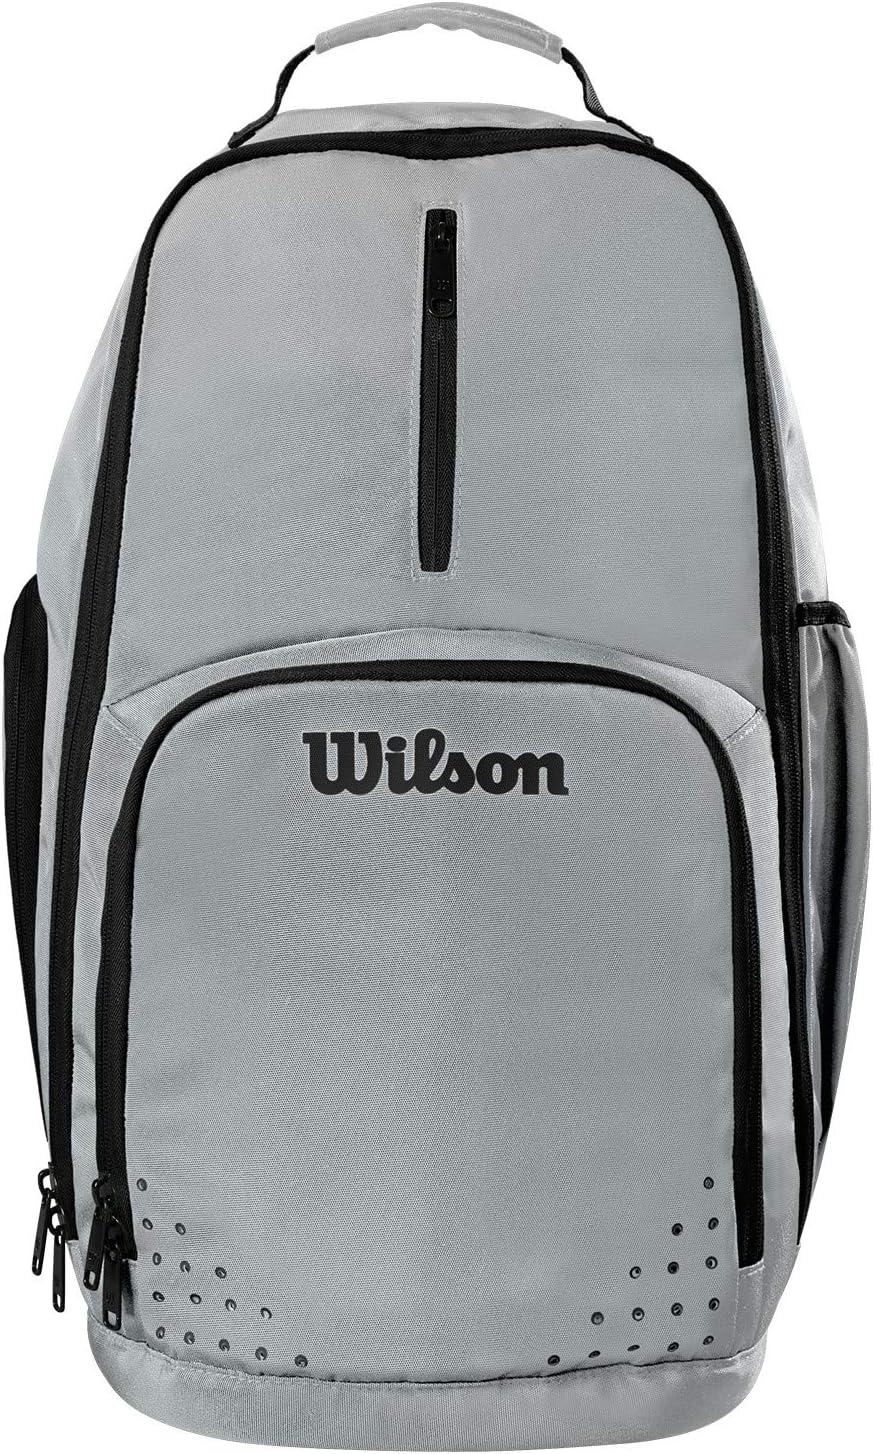 Wilson Evolution High quality Backpack Soldering